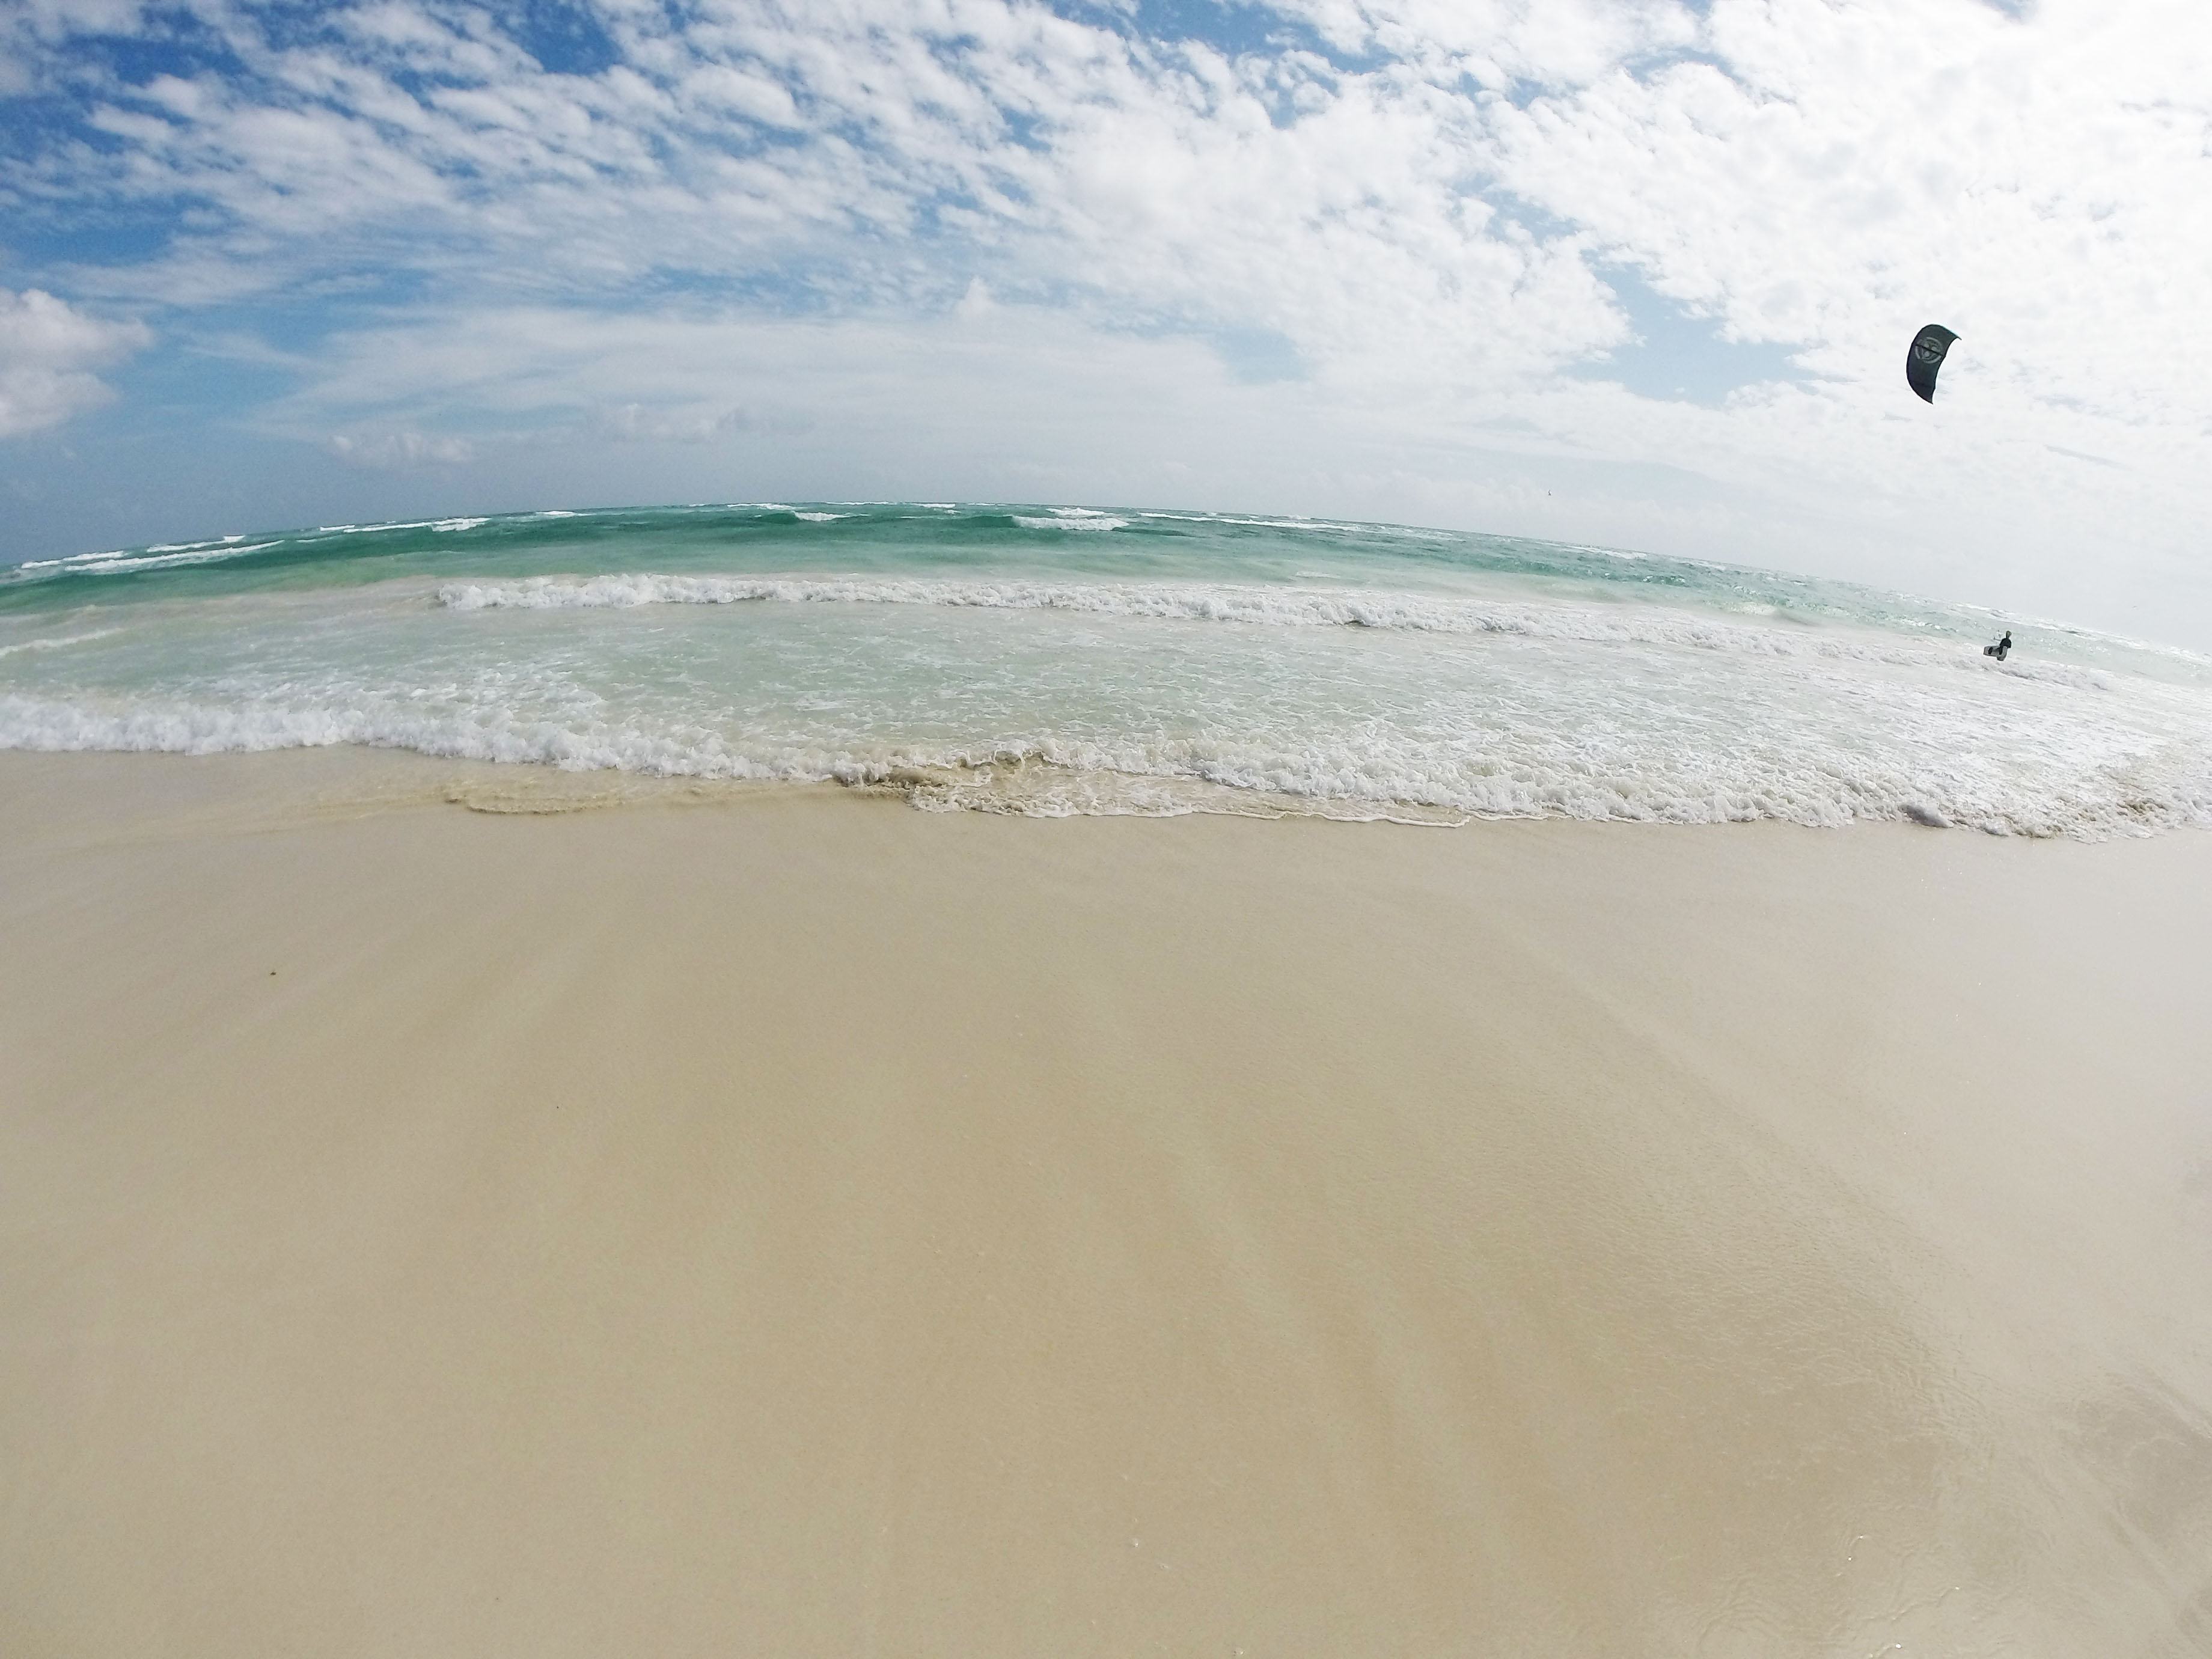 Playa del Carmen o Tulum? Ecco qual è la località più adatta a voi! 3